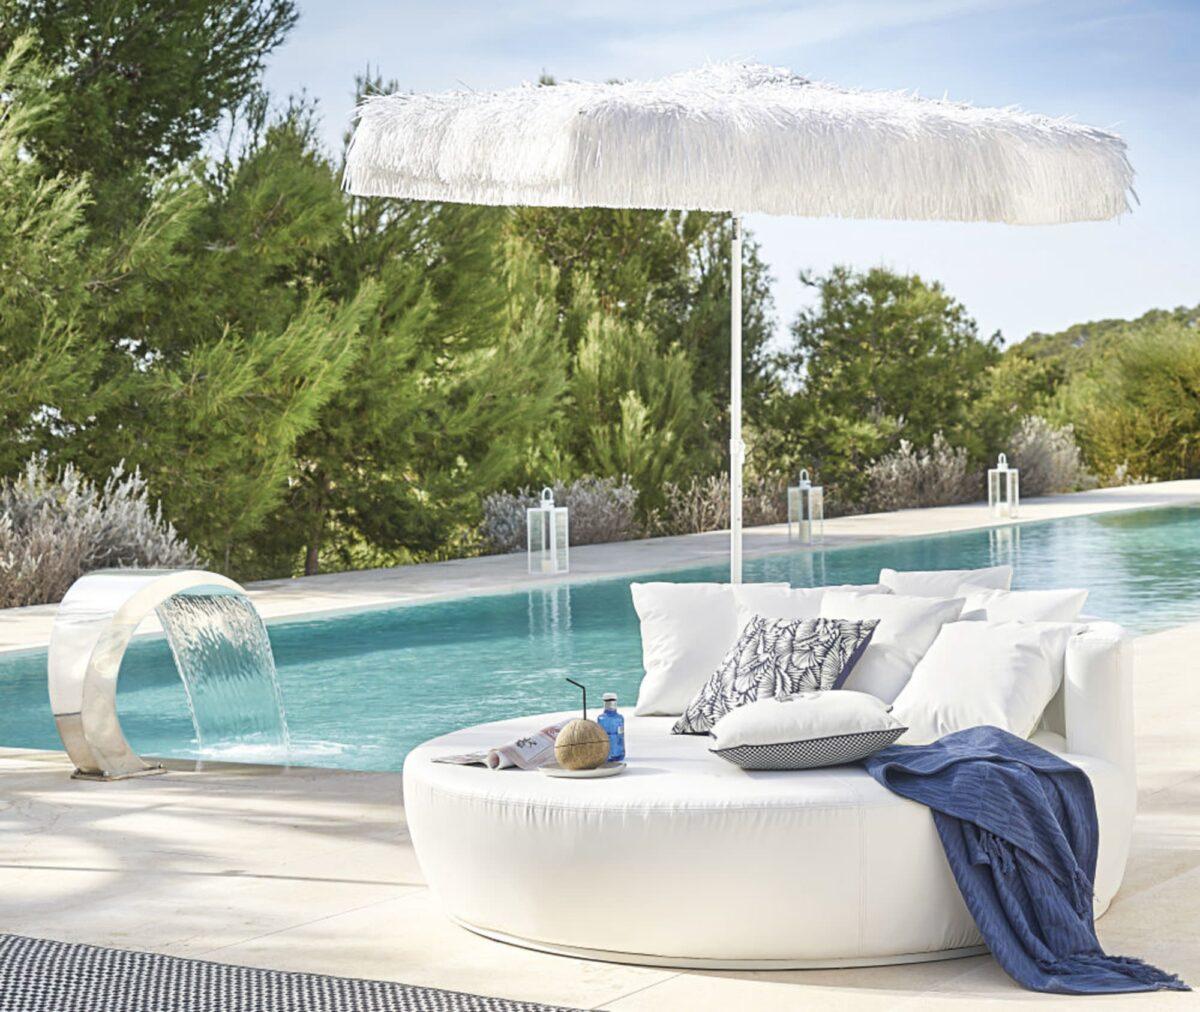 Maisons-du-Monde-divano-da-giardino-rotondo-2-posti-in-tessuto-spalmato-bianco